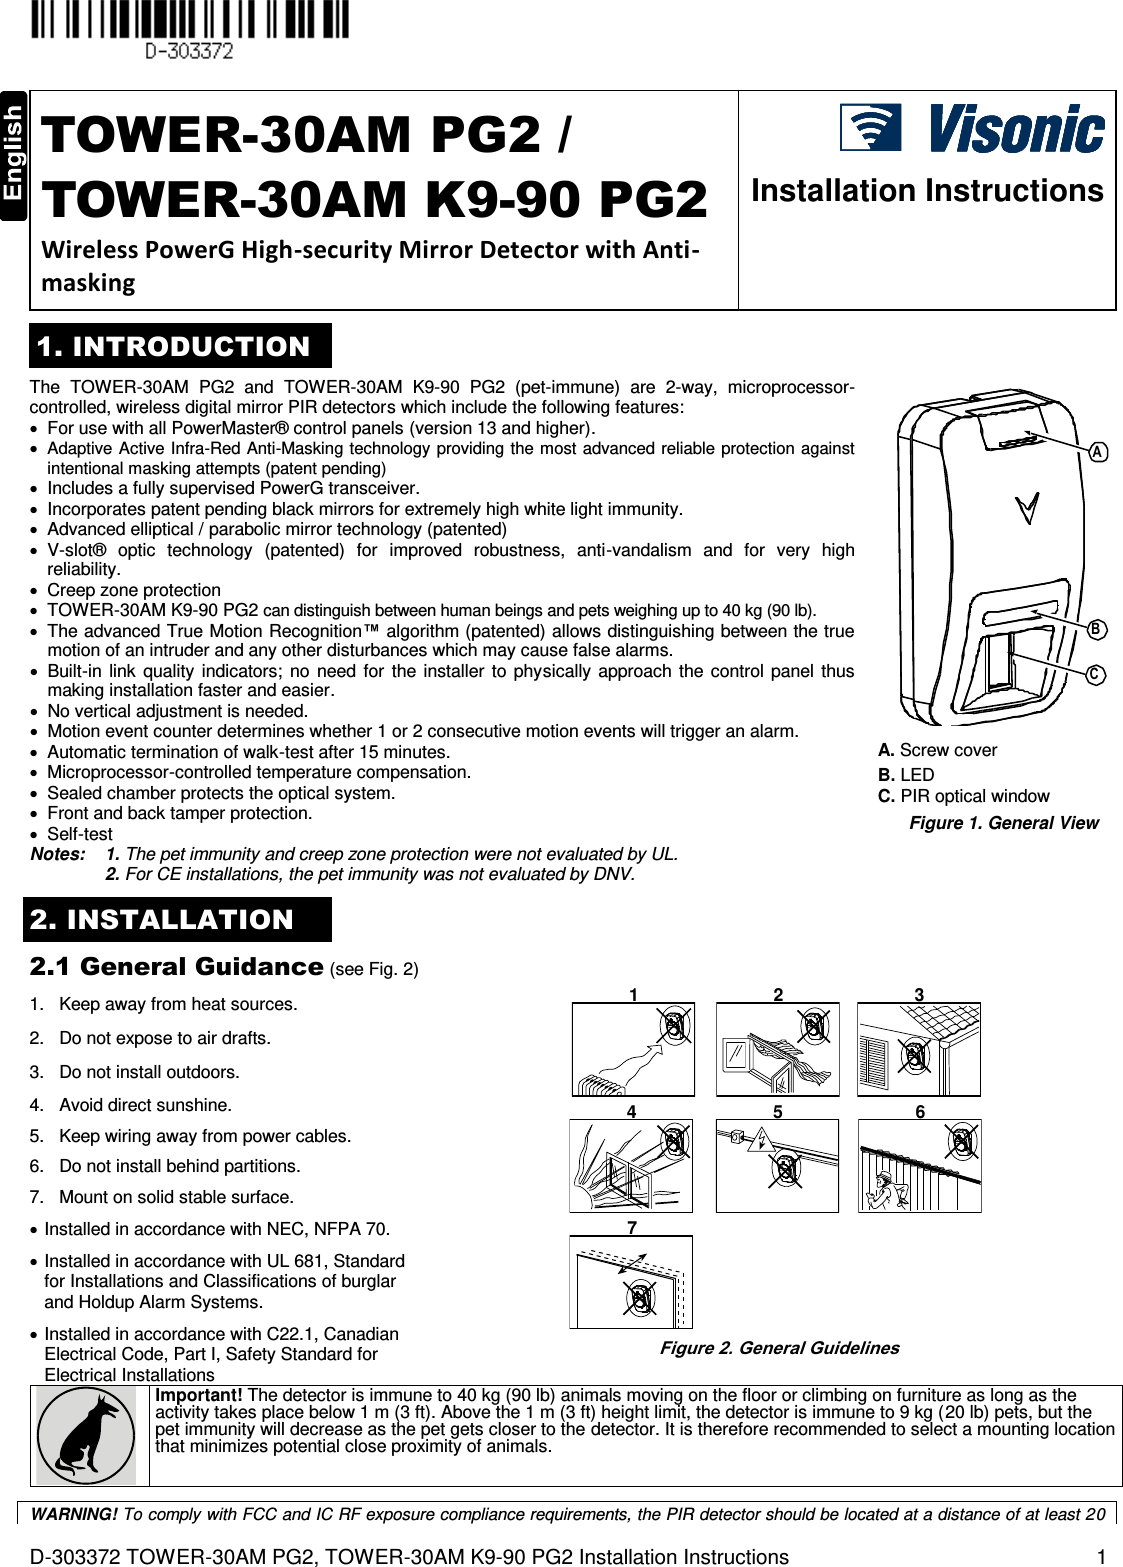 Visonic RFD PG2 RF Module, RFD User Manual